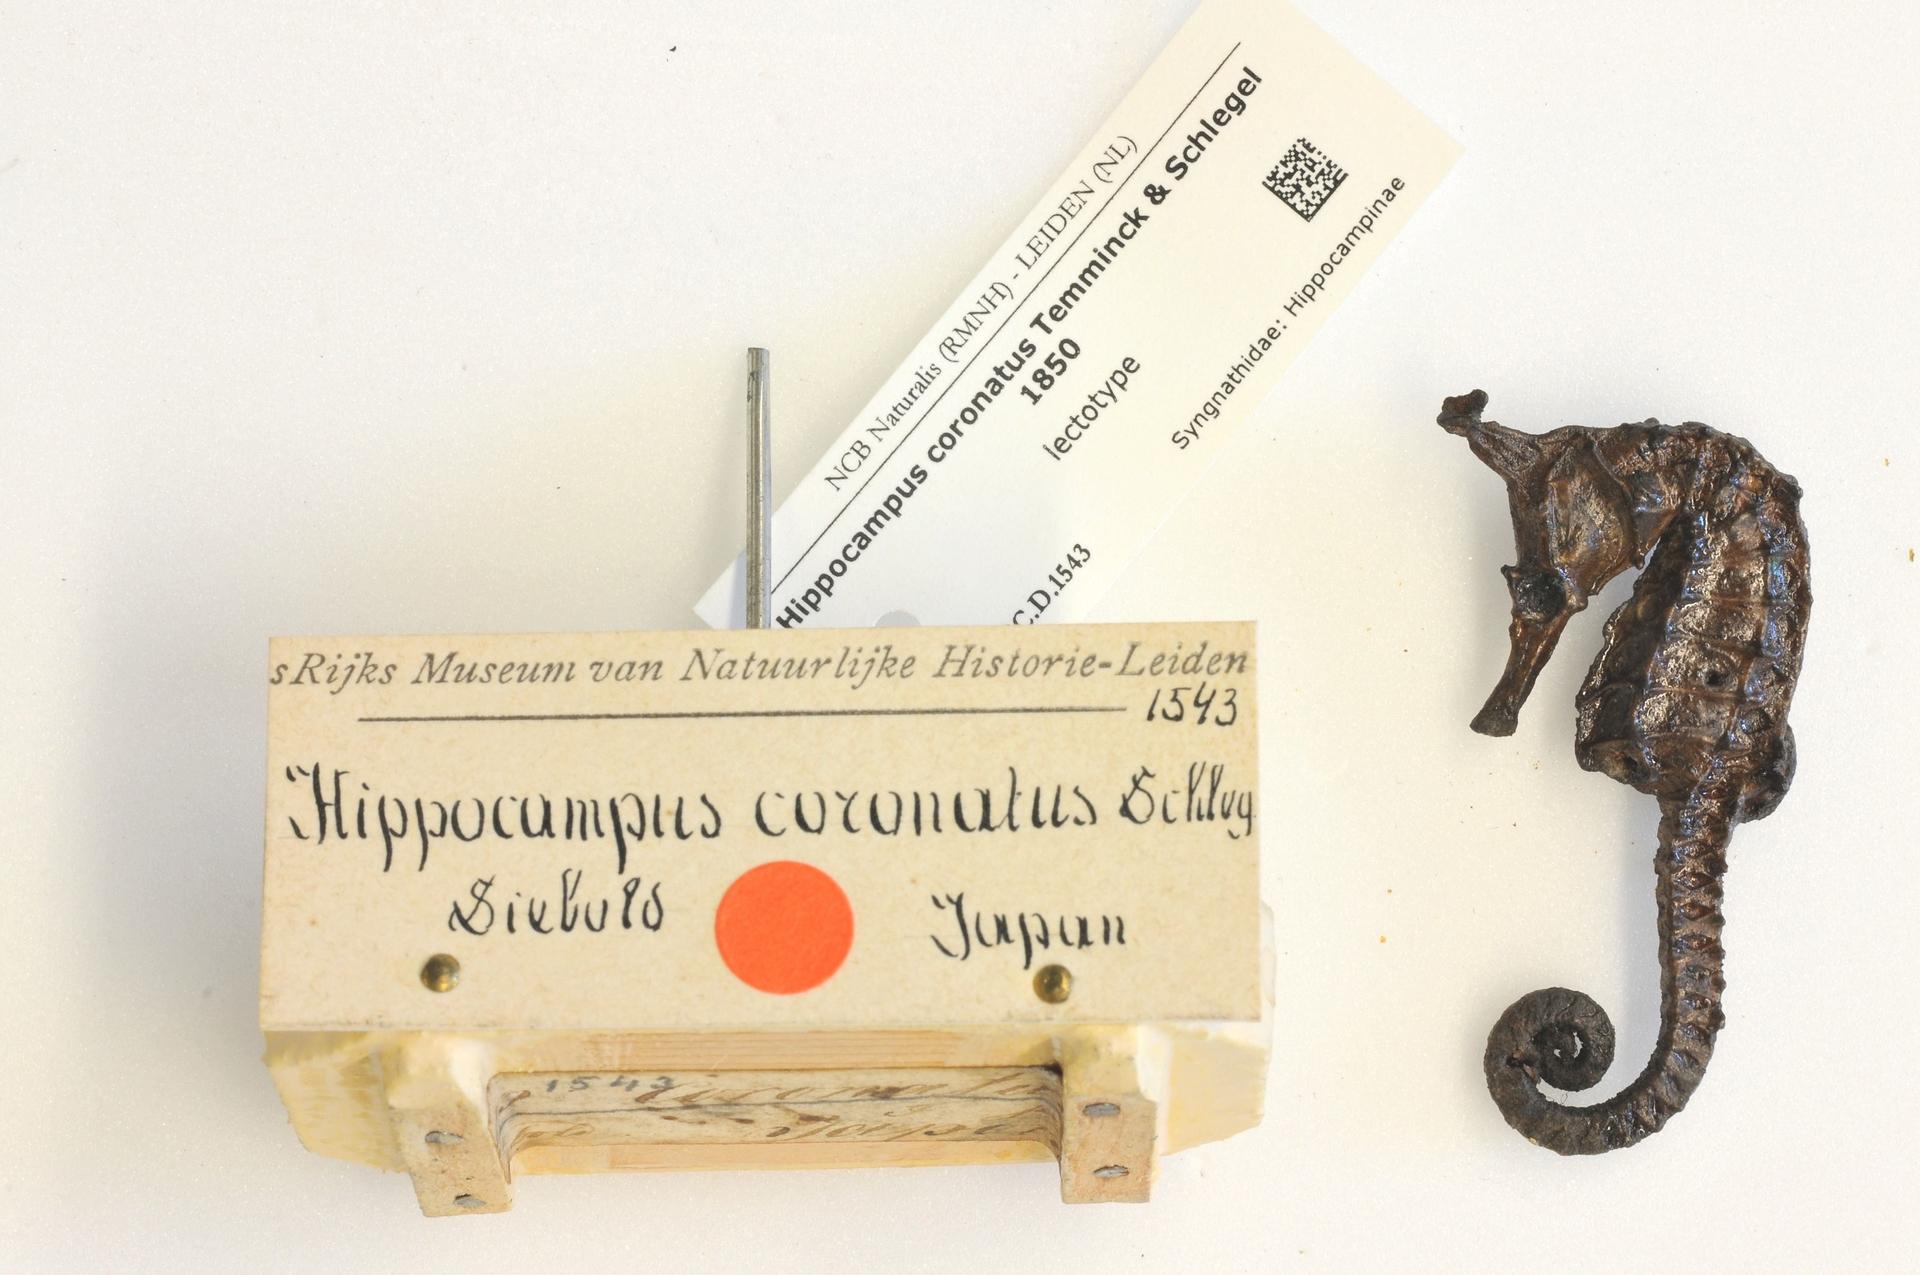 RMNH.PISC.D.1543 | Hippocampus coronatus Temminck & Schlegel 1850